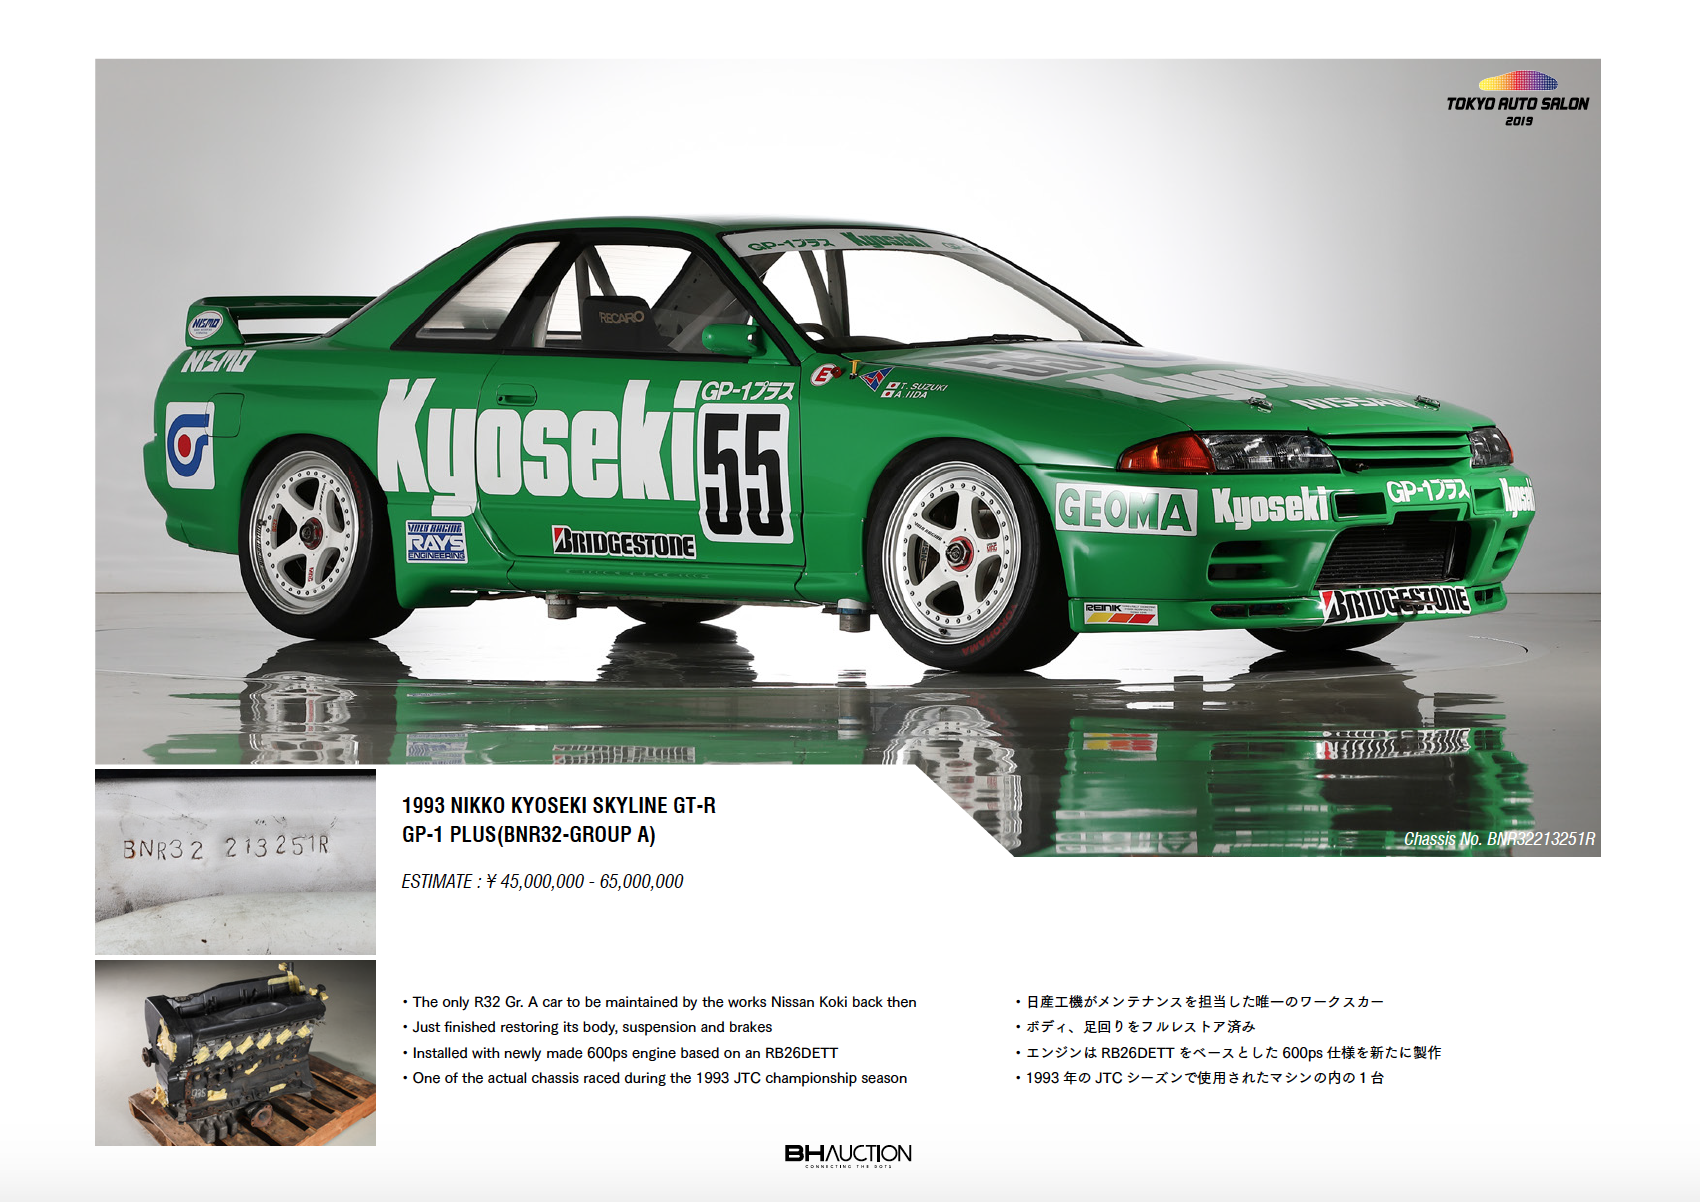 1993 NIKKO KYOSEKI SKYLINE GT-R GP-1 PLUS .png